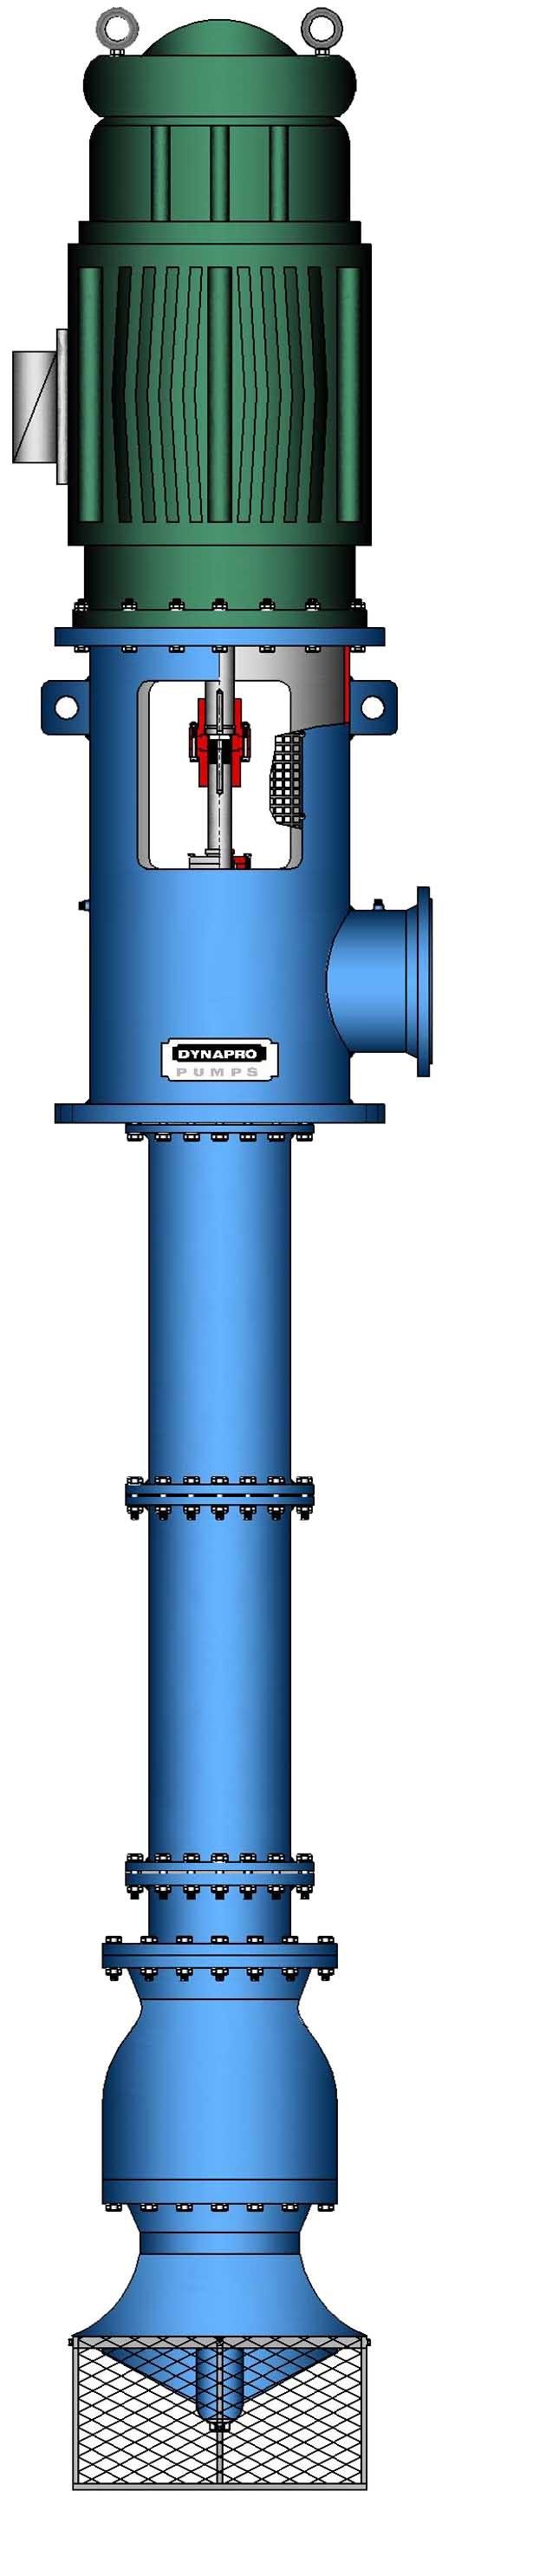 API610 (VS1) Vertical Line Shaft Multistage Process Pump (open sump)